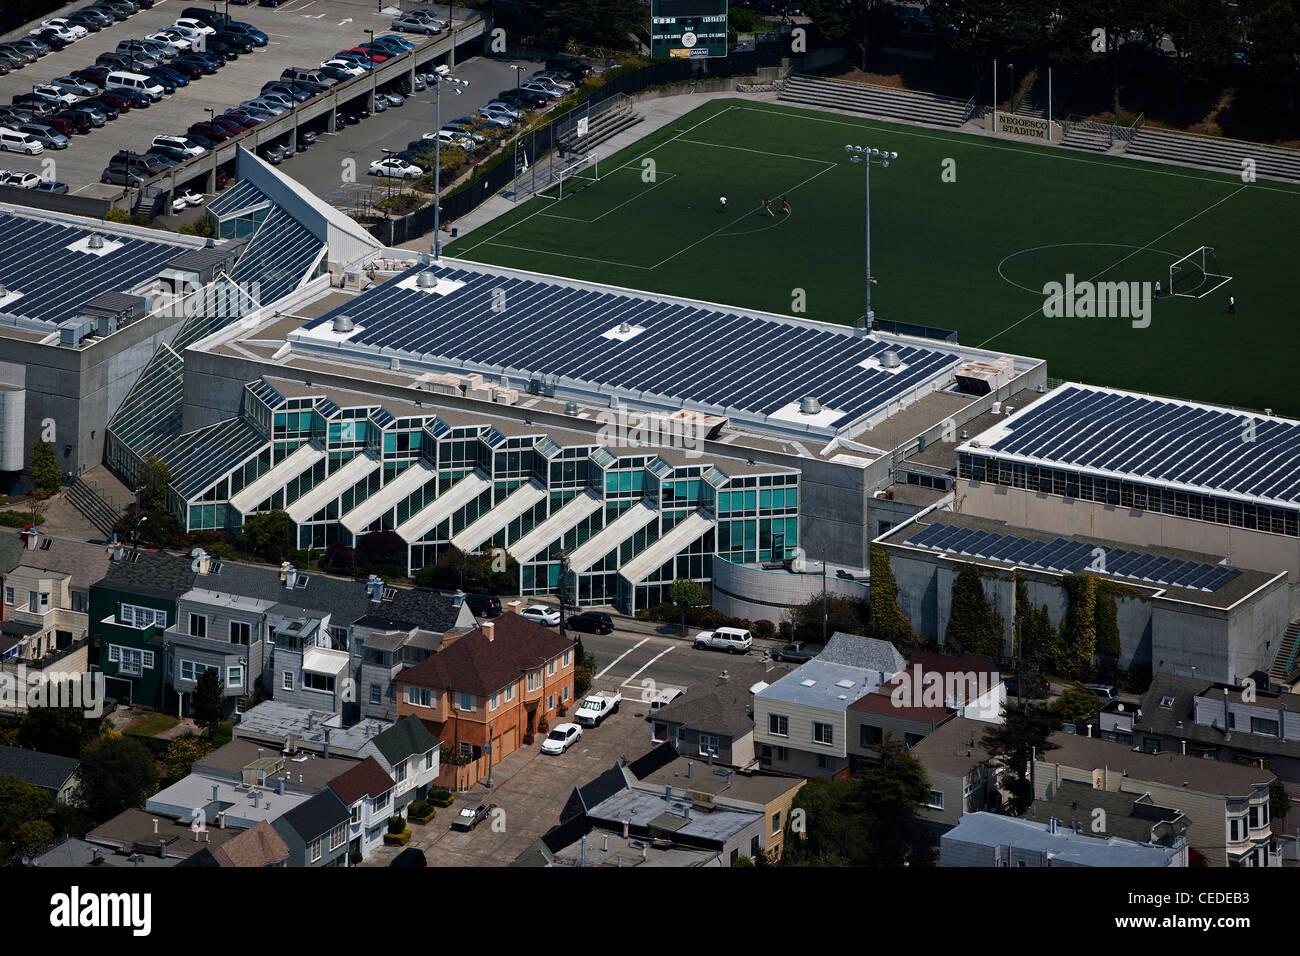 aerial photograph solar panels University of San Francisco, California - Stock Image